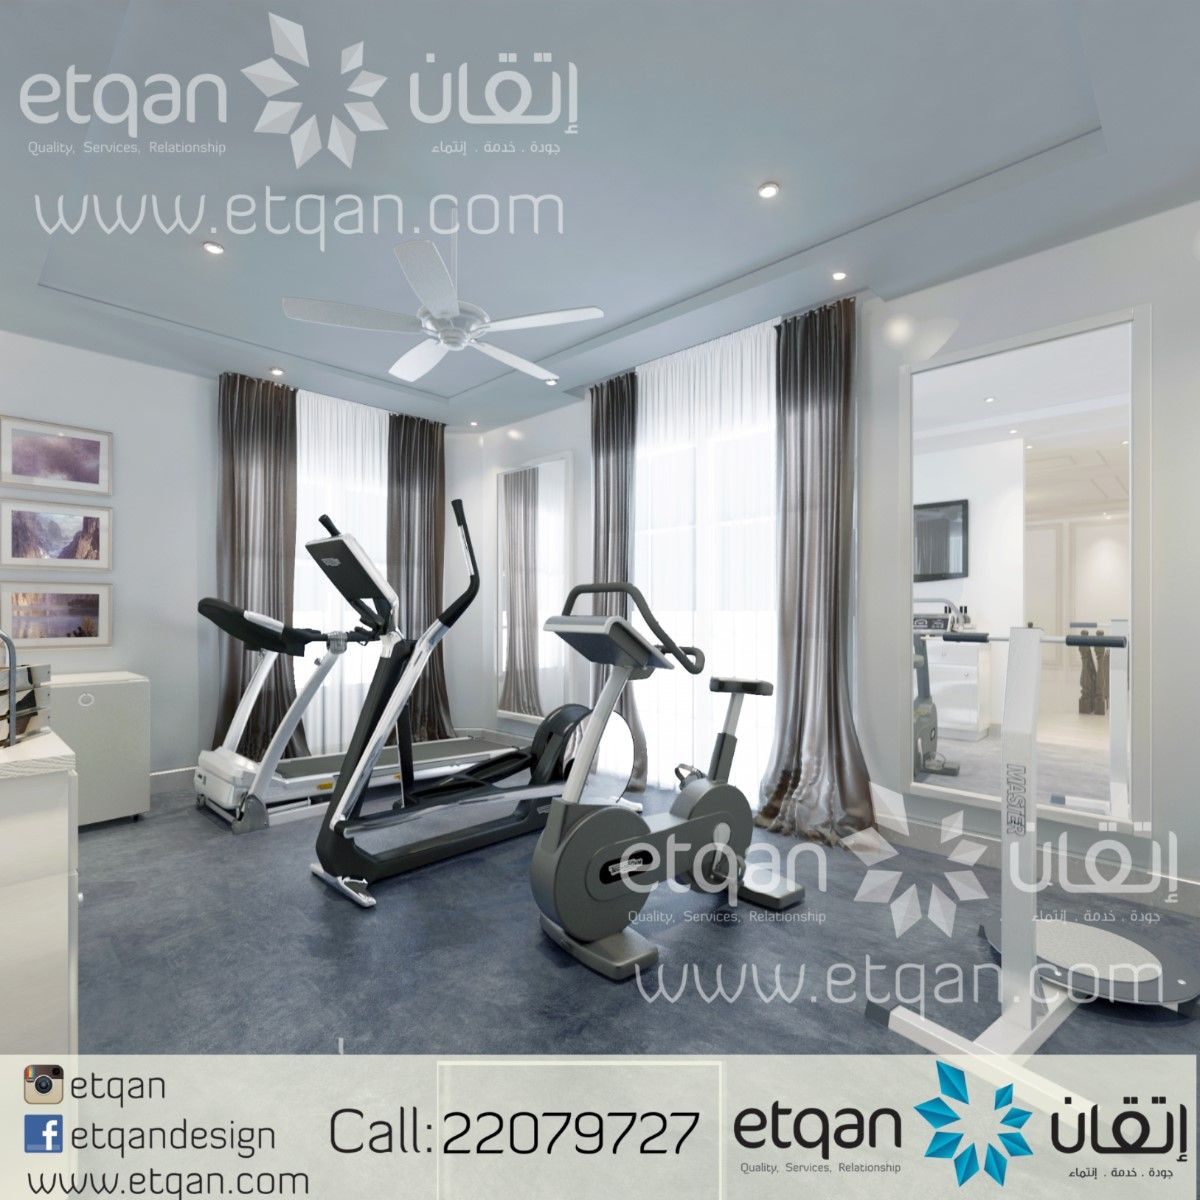 تصميم ديكورات صالة رياضية منزلية اتقان Etqan تصميم داخلي ديكور صالة رياضة حديث ديكورات Decore Gym Room Oman Muscat I Home Design Home Decor